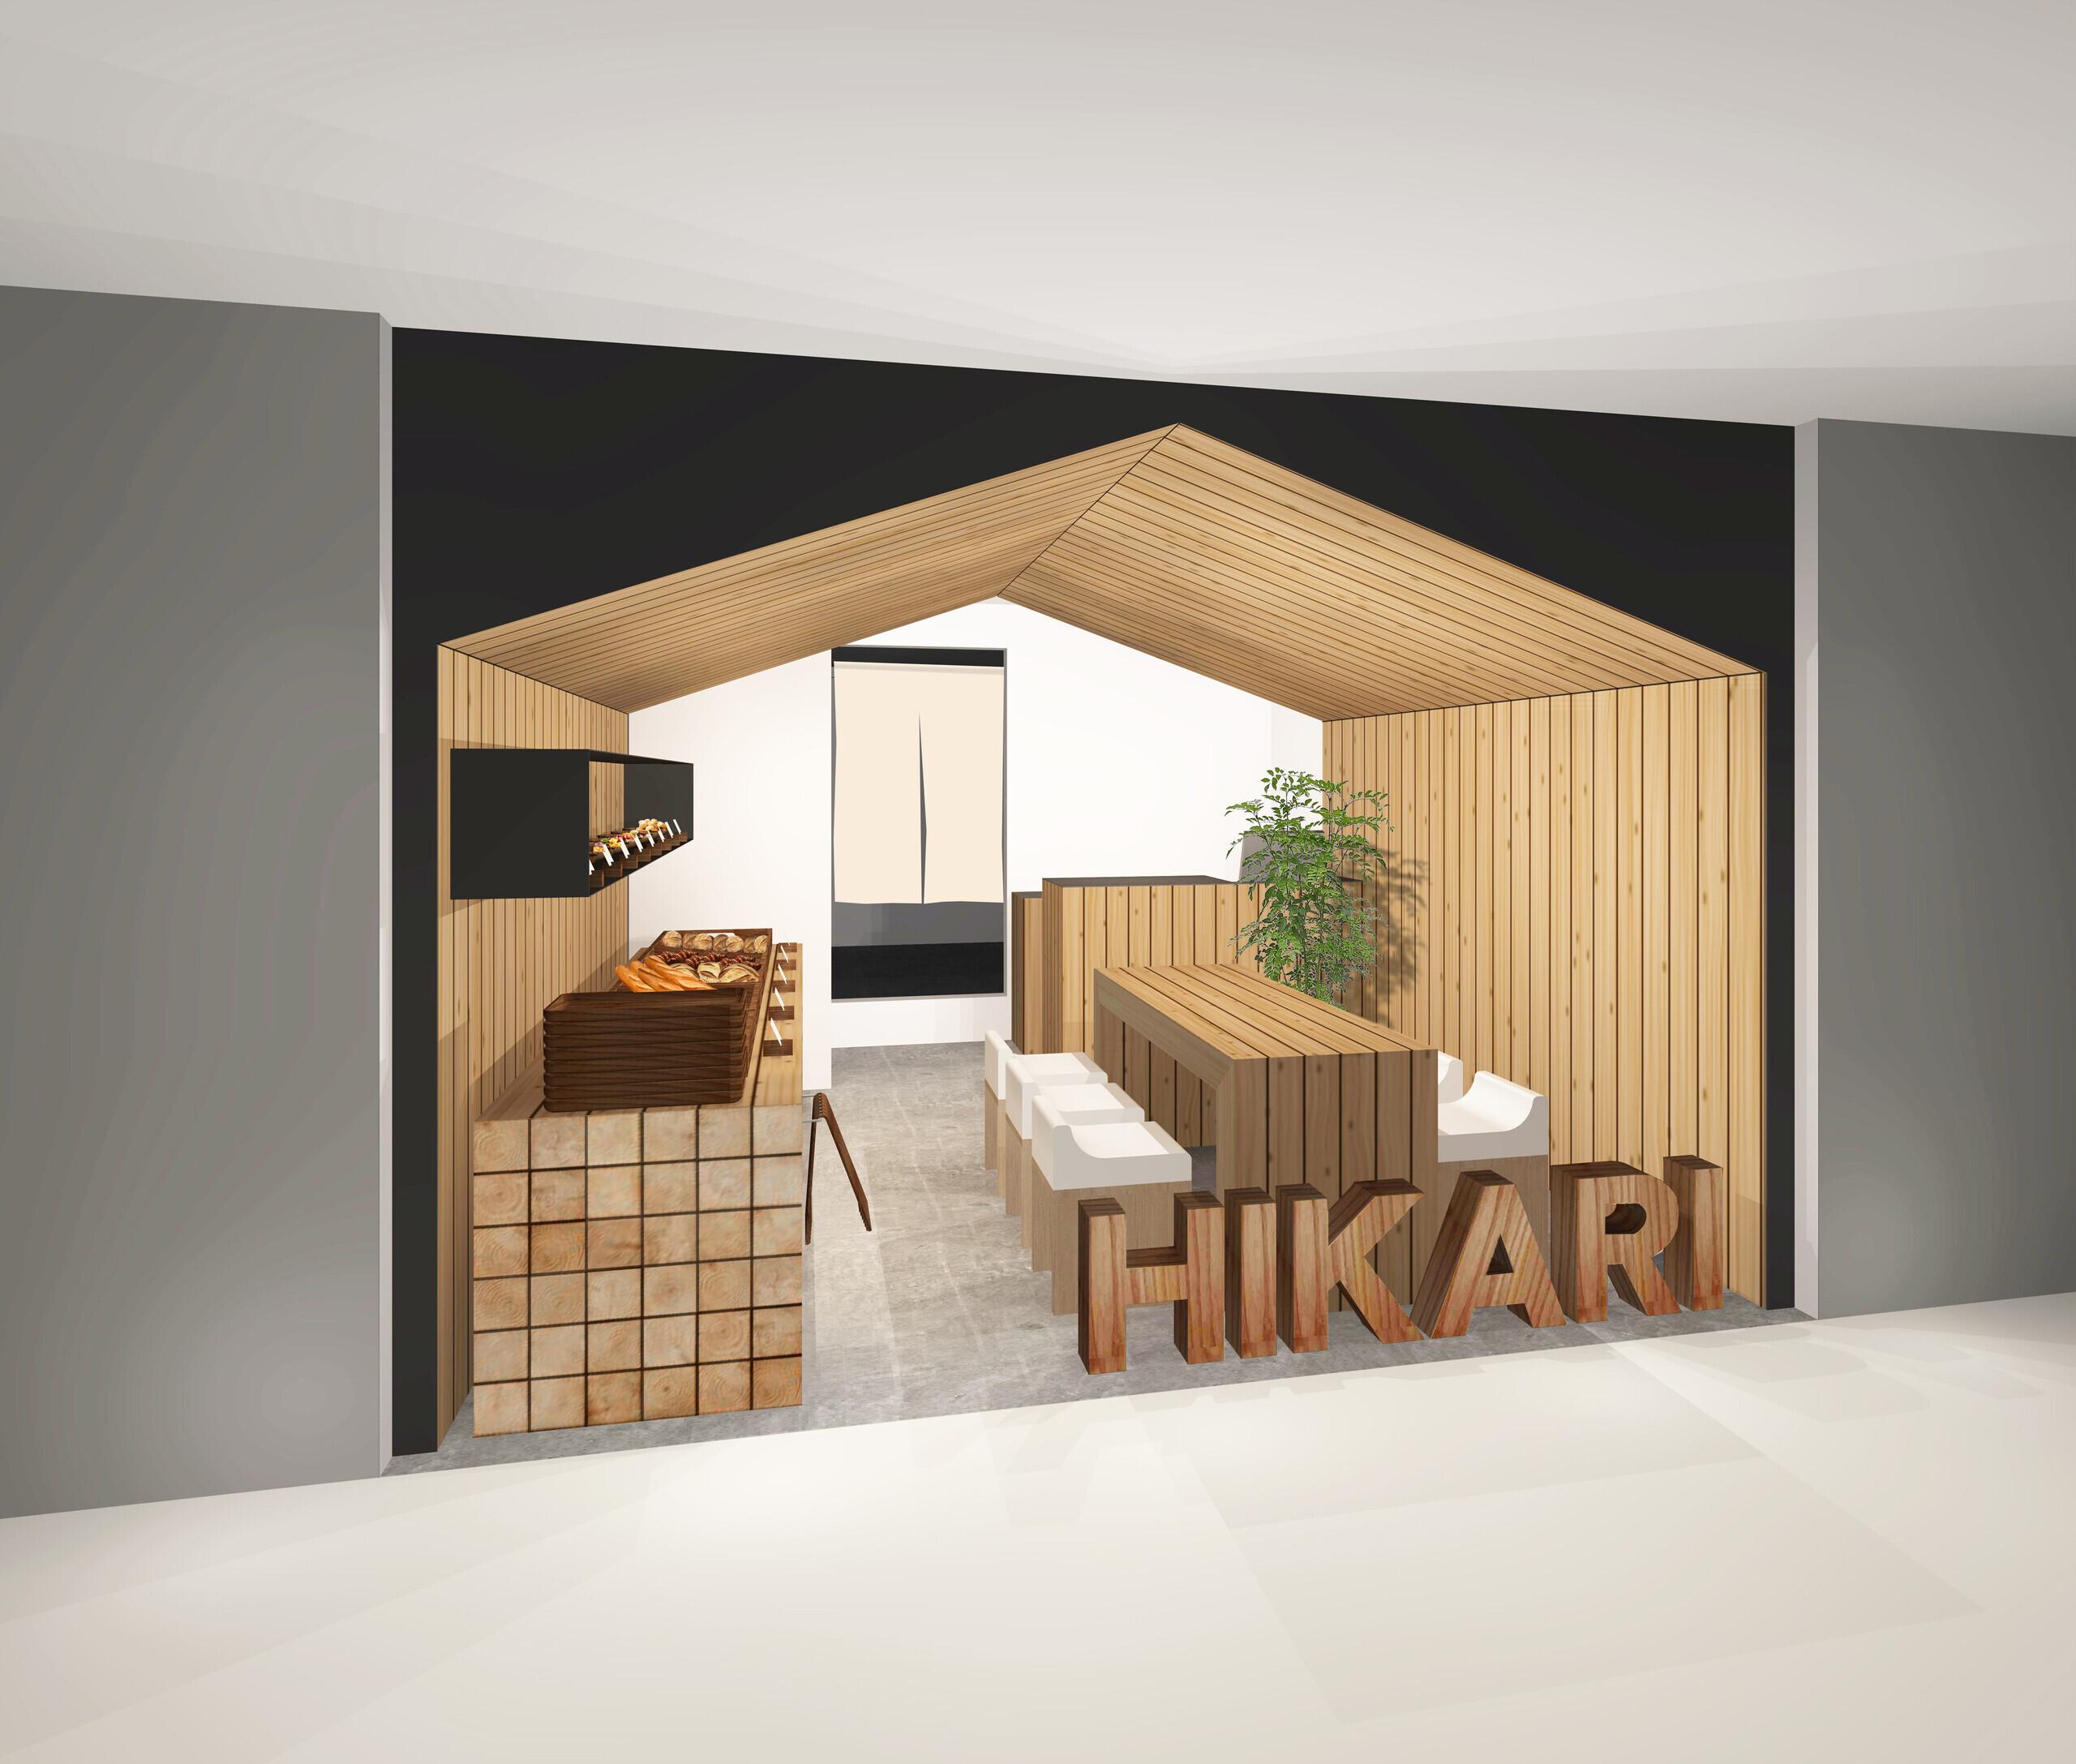 HikariBakeryの建築事例写真